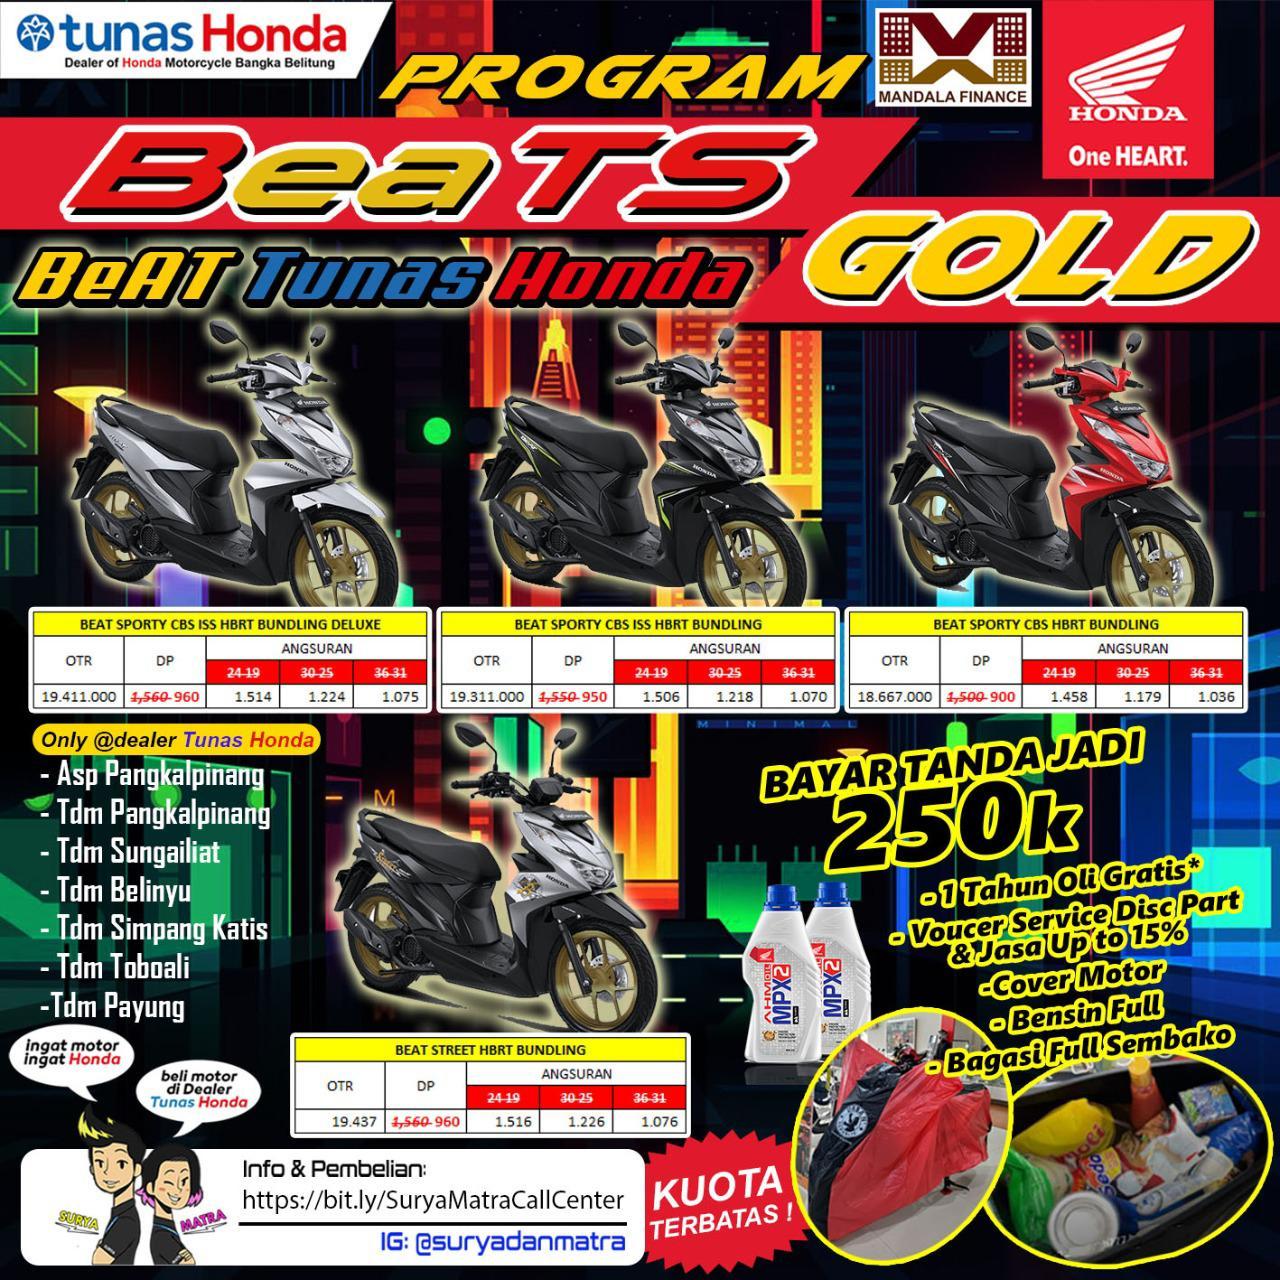 Tunas Honda Resmi melakukan launching New BeAT Special Edition (Velg Gold),(16/06).